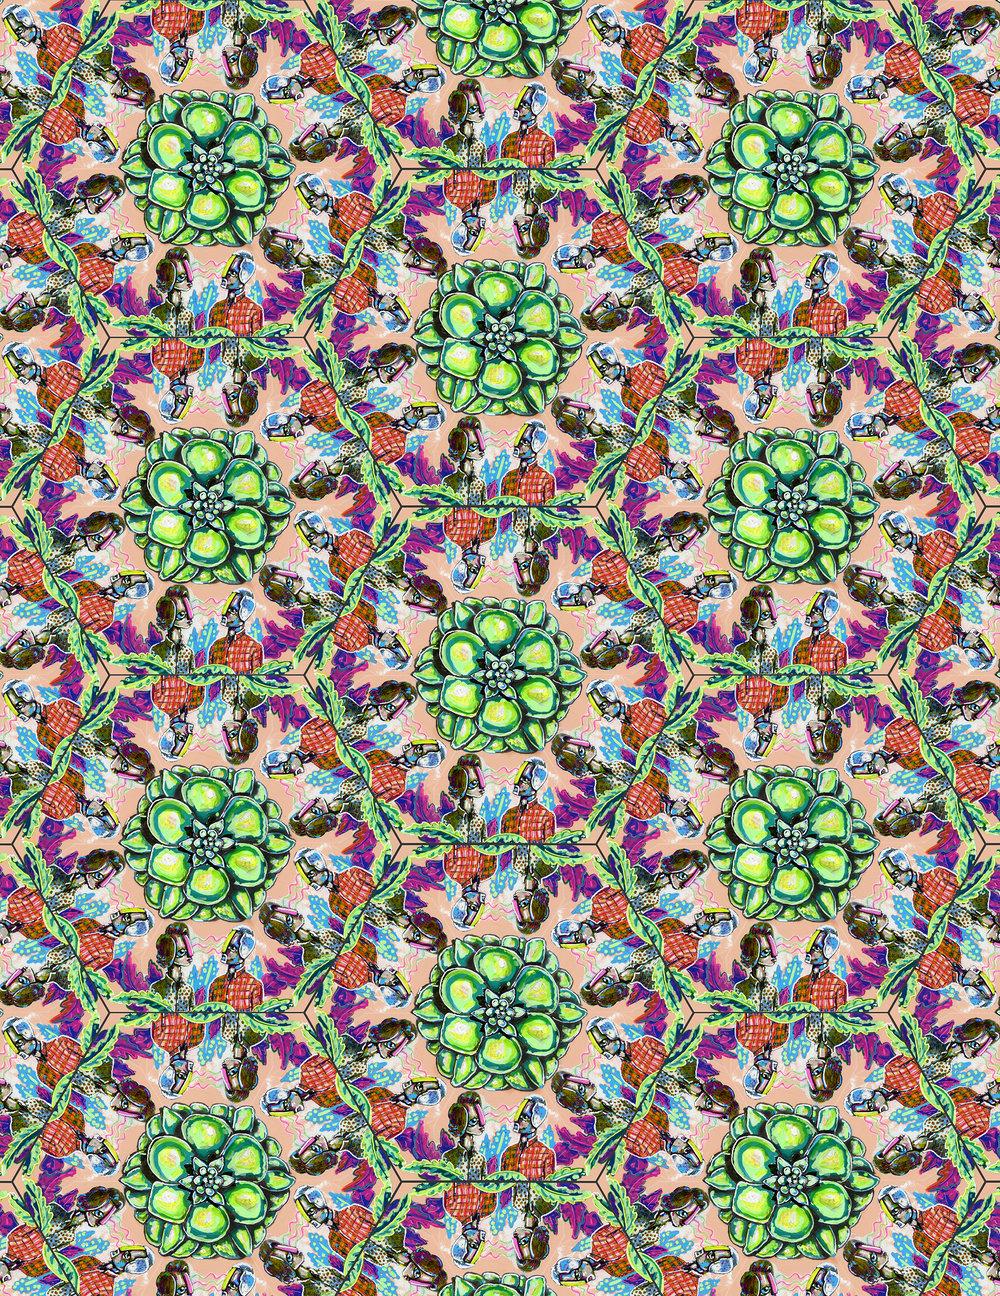 costco woven throw 54x70.jpg